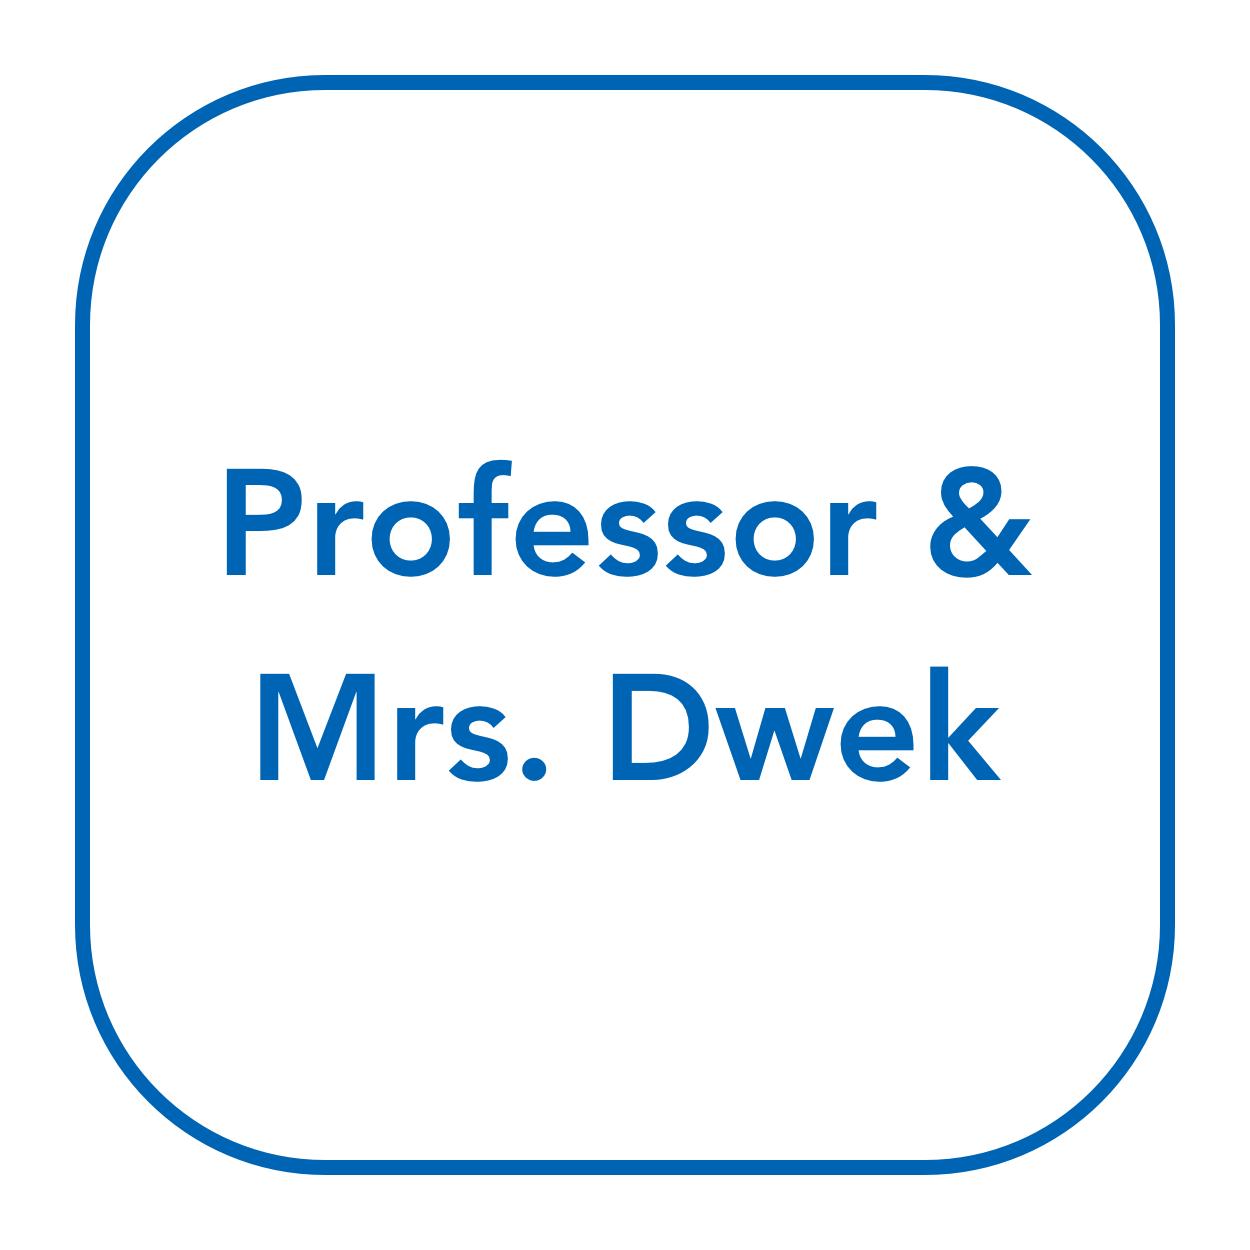 Professor & Mrs. Dwek